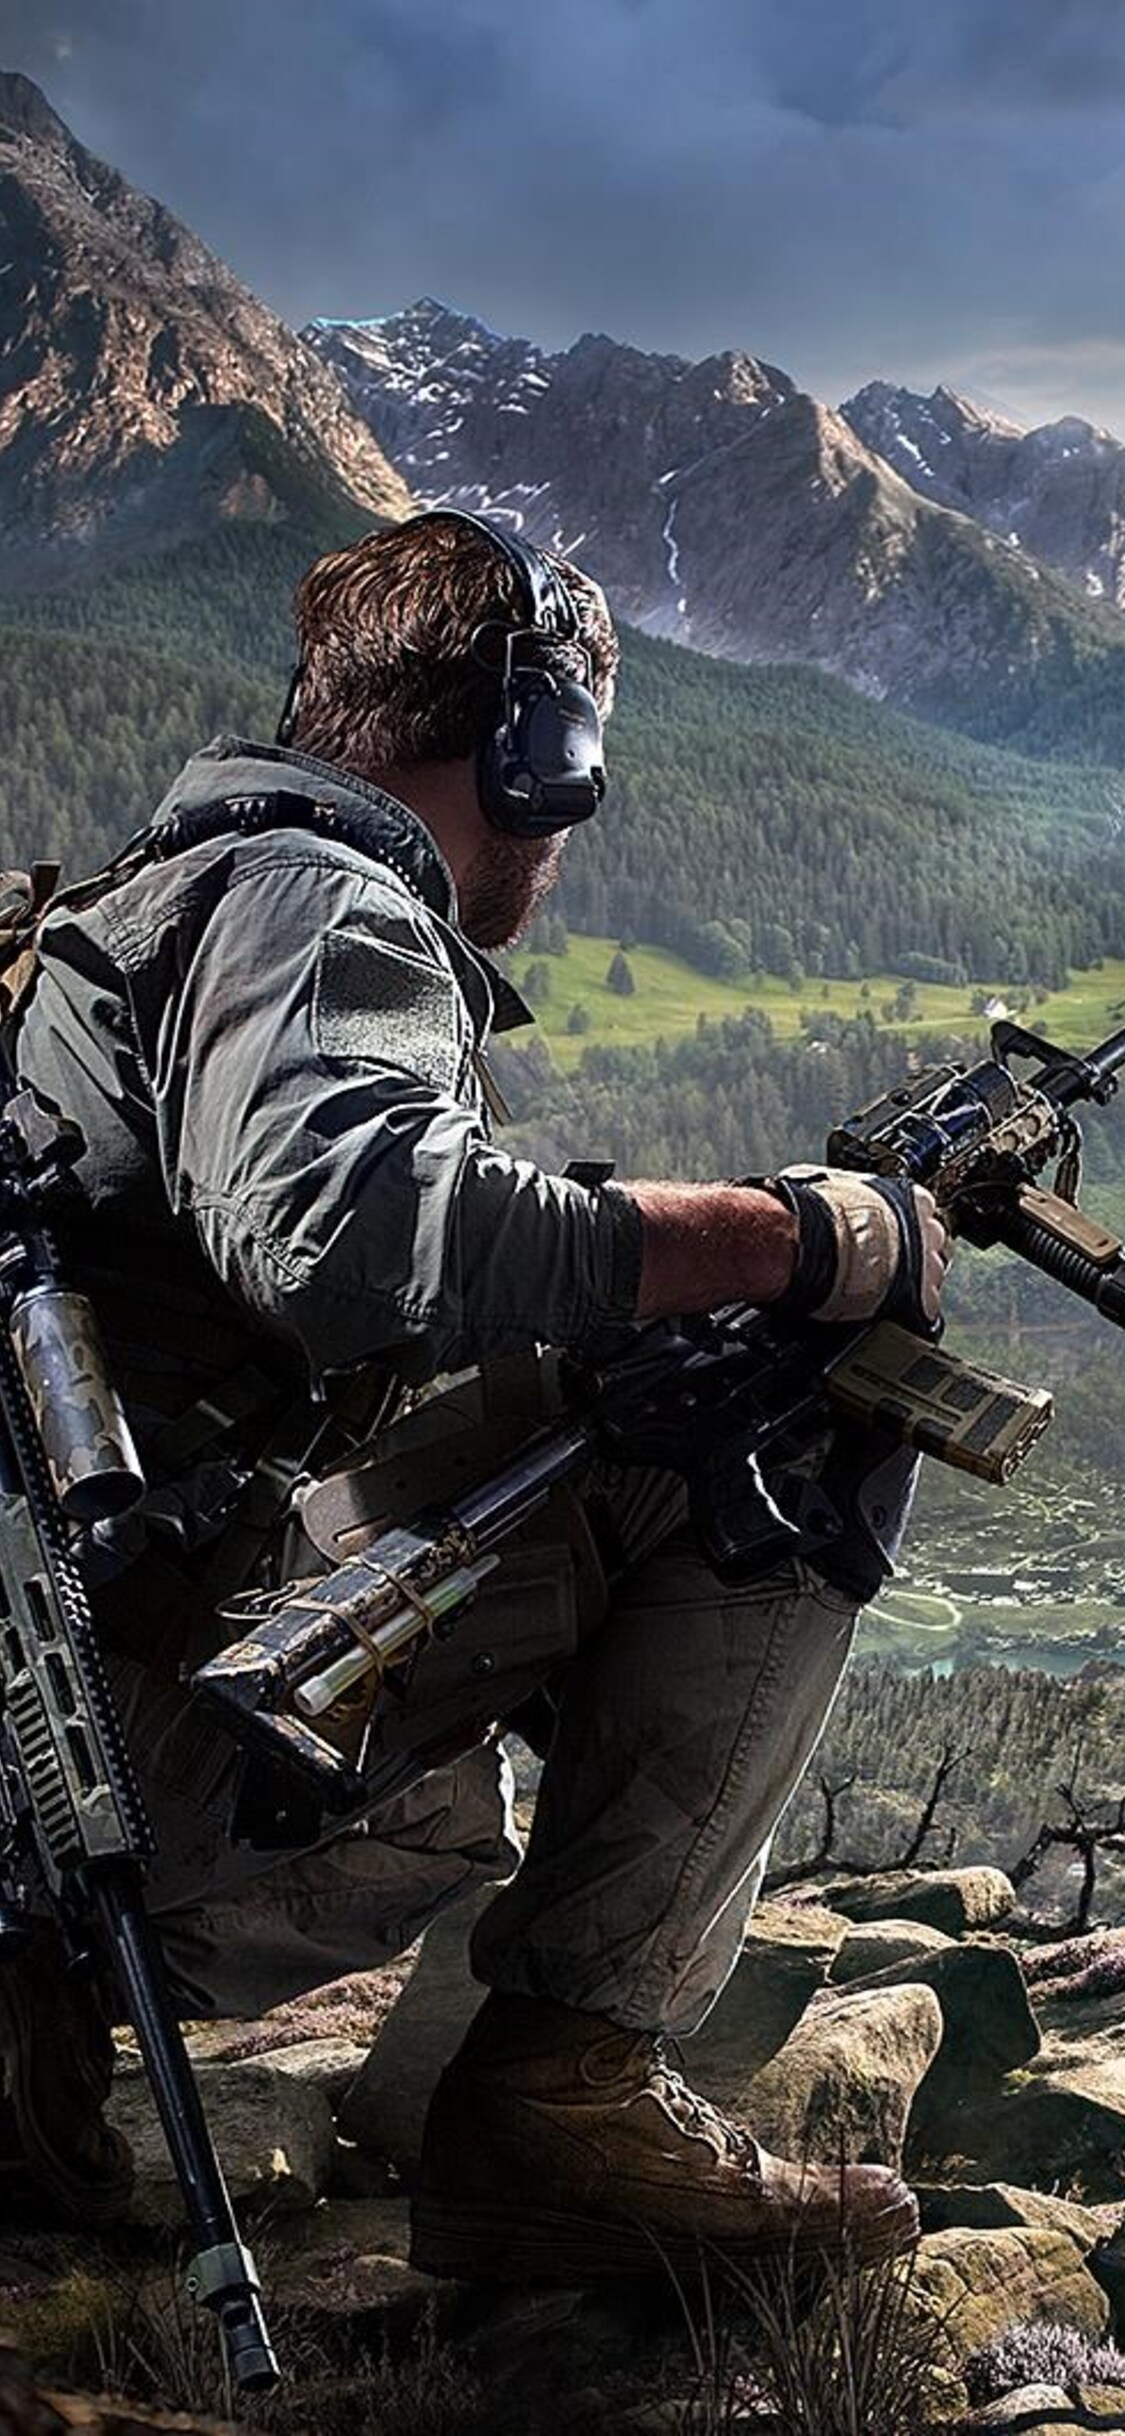 1125x2436 Sniper Ghost Warrior 3 Iphone Xs Iphone 10 Iphone X Hd